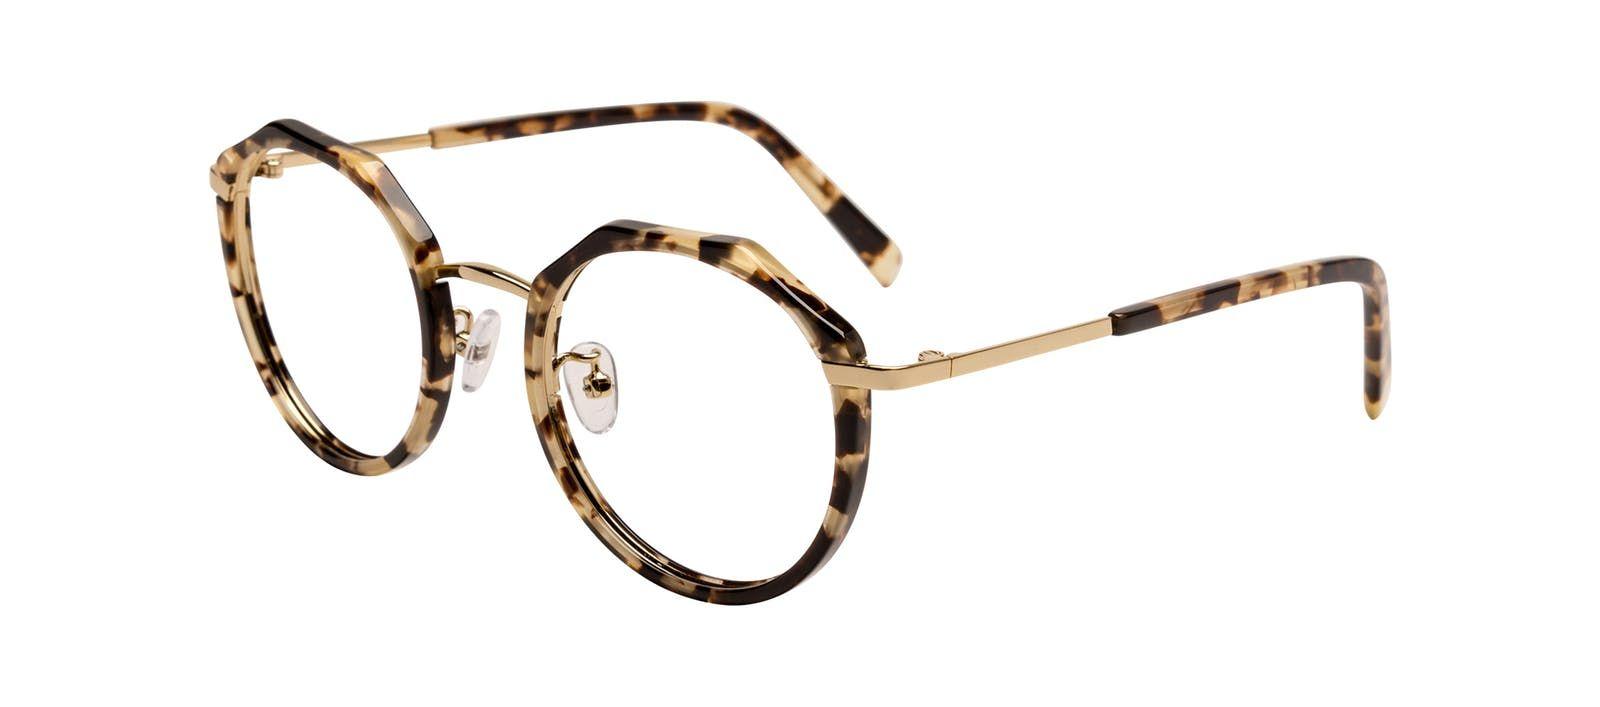 ff304c68fb9e Affordable Fashion Glasses Round Eyeglasses Women Womance Mayz Tilt